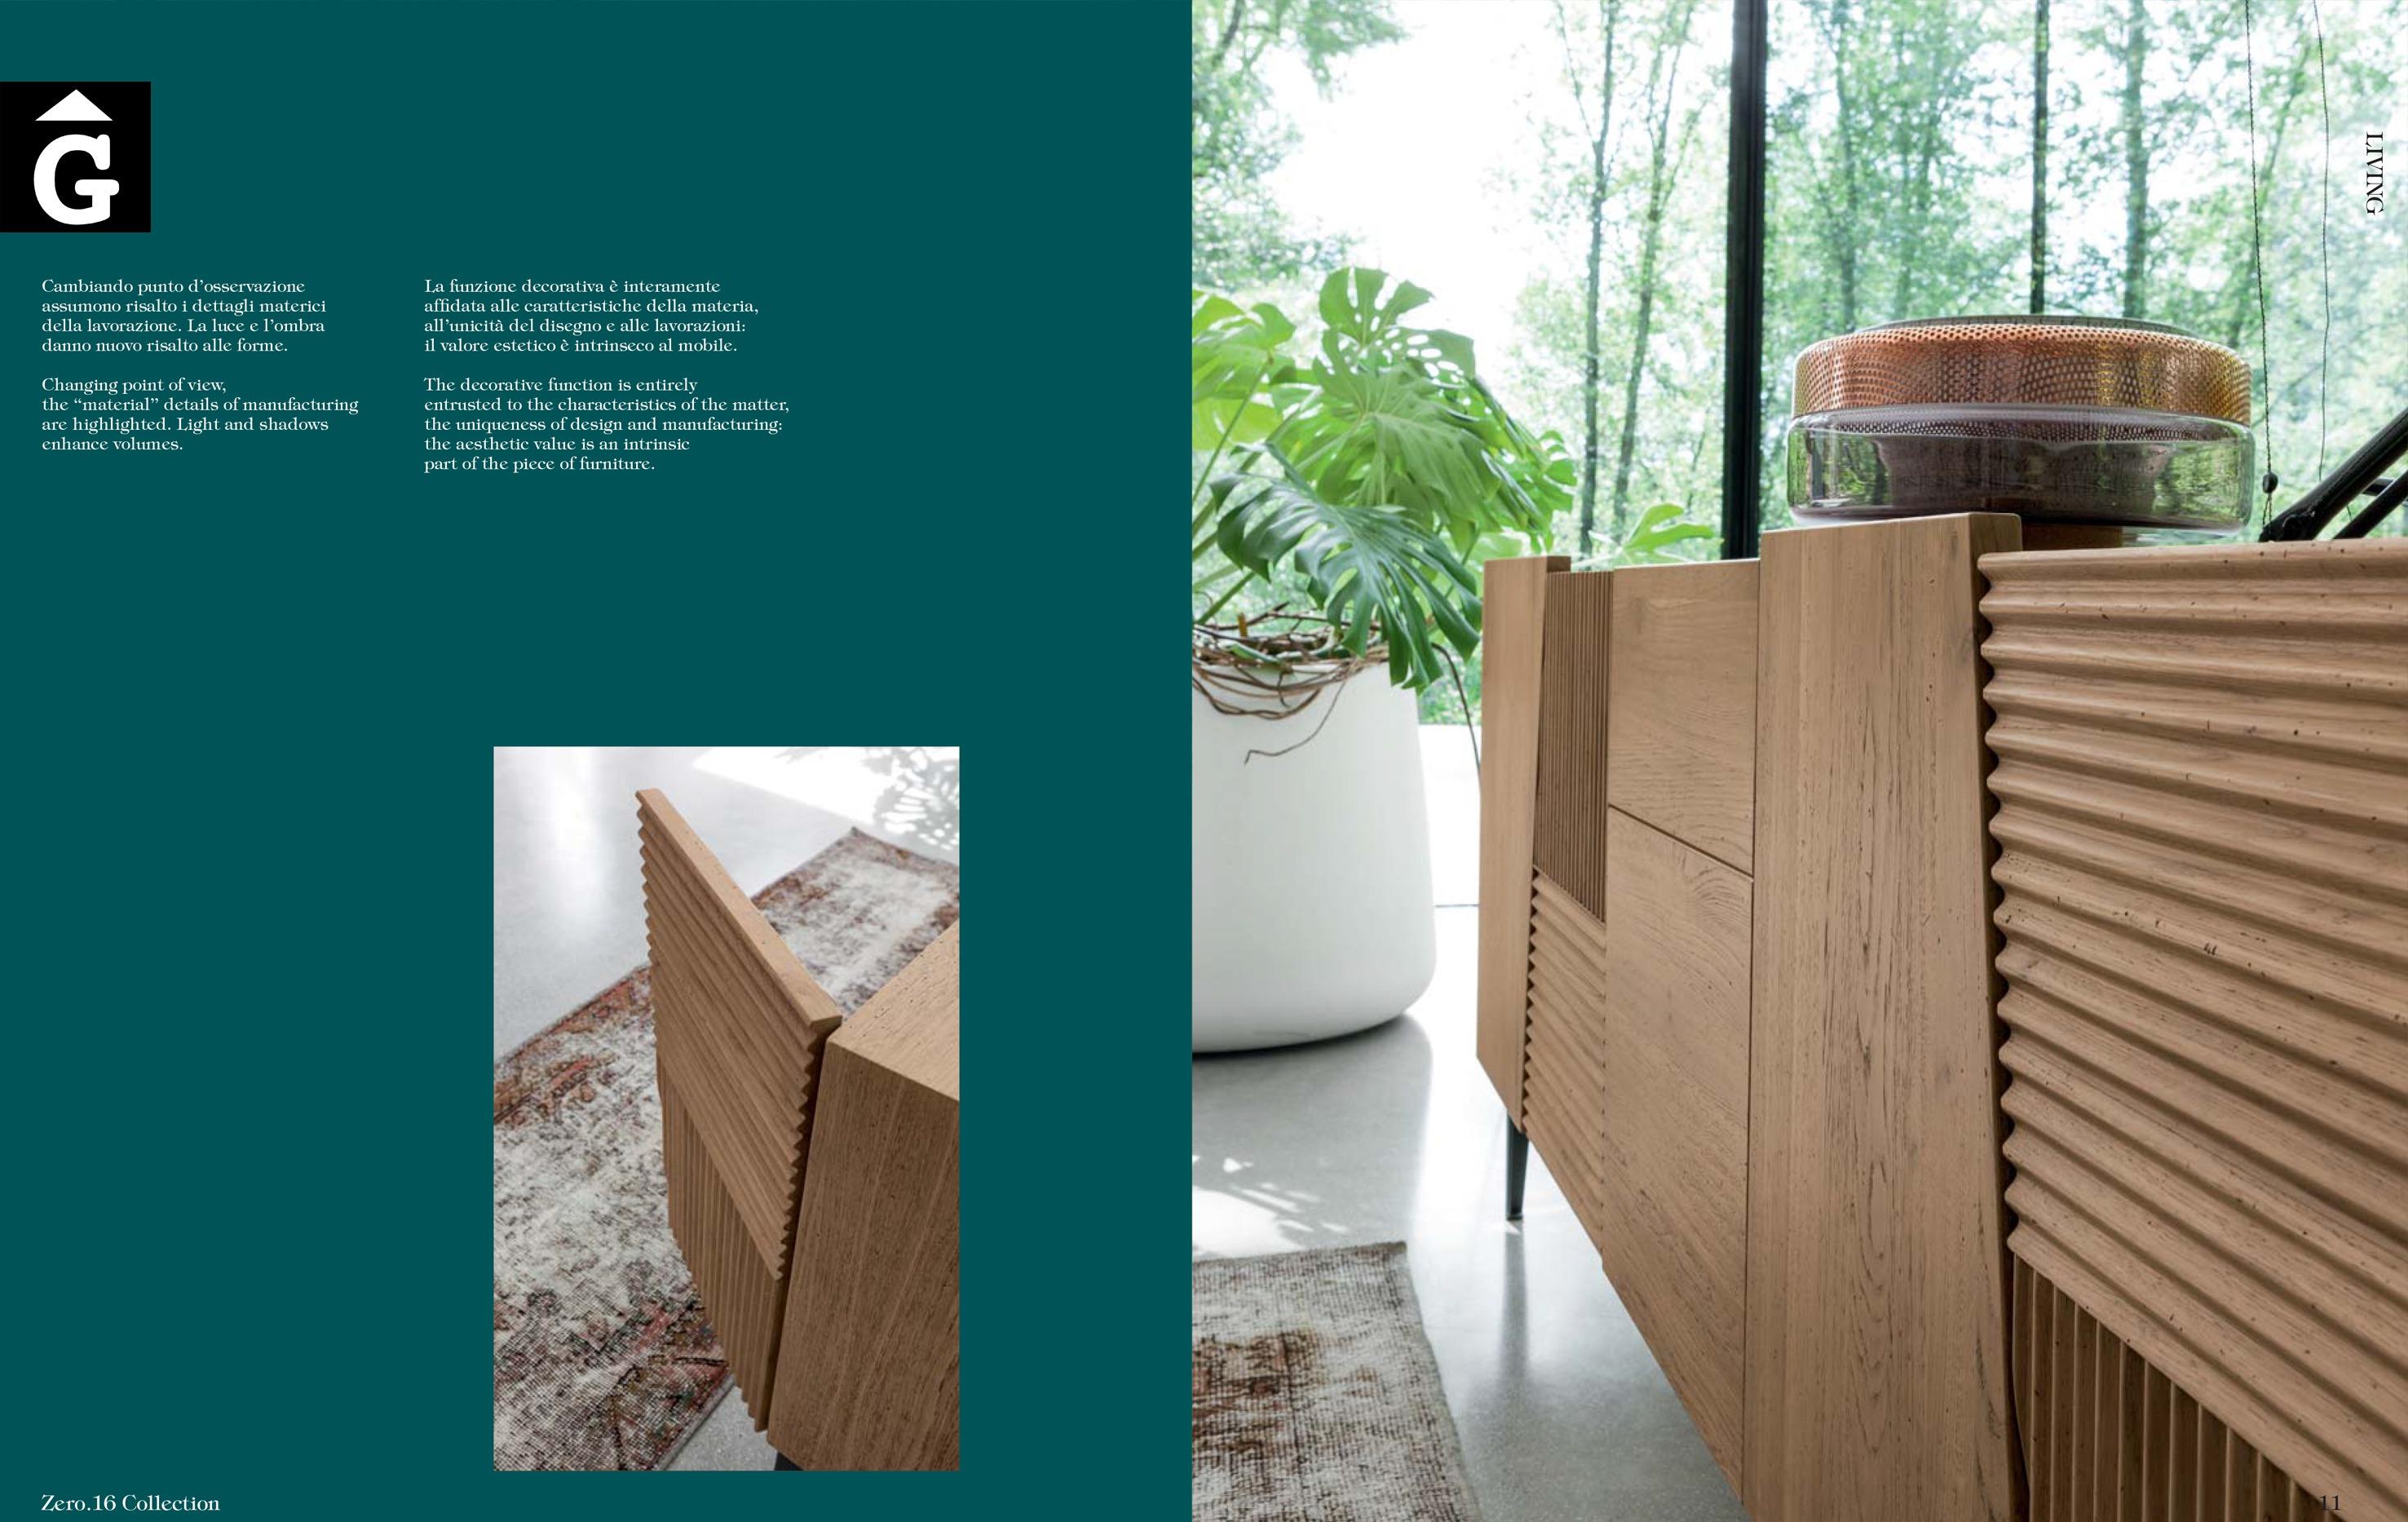 Imatge detall moble bufet massis roure Zero 16 by mobles Gifreu